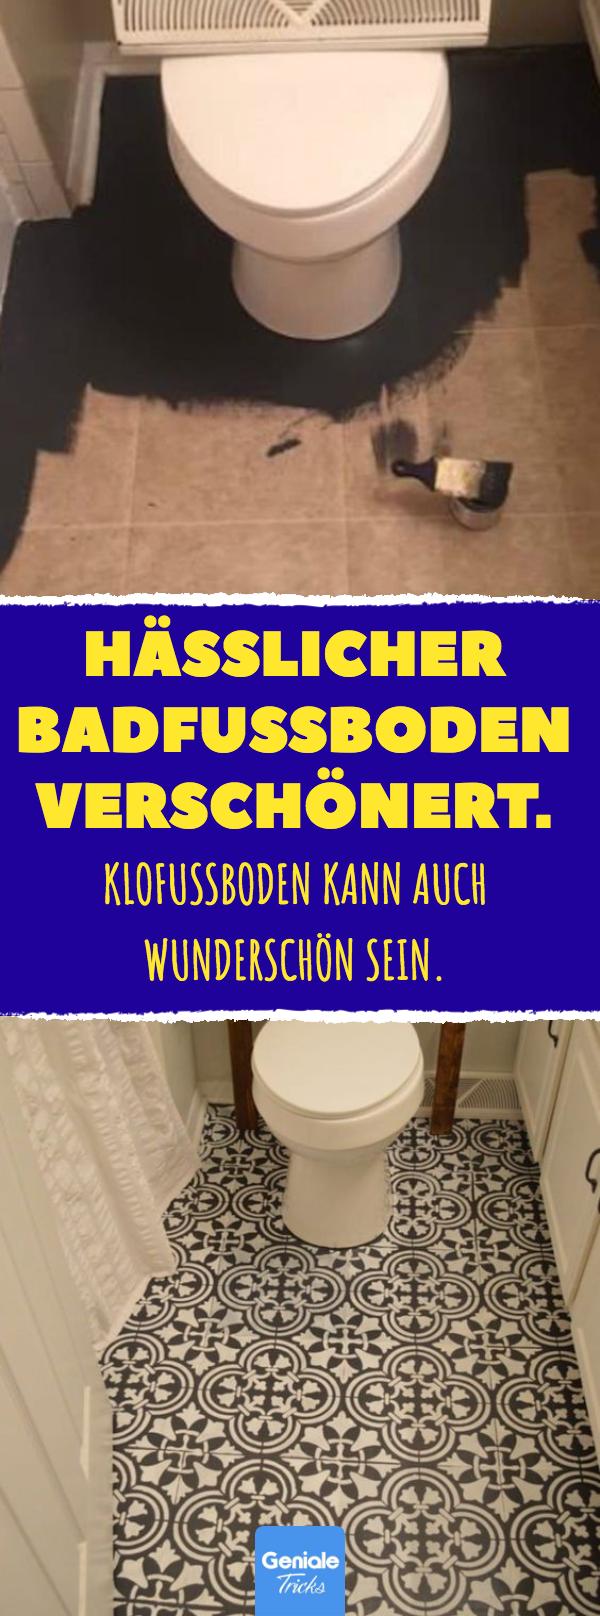 Pvc Fliesen Badezimmer | Hasslicher Badfussboden Verschonert Bad Toilette Badezimmer